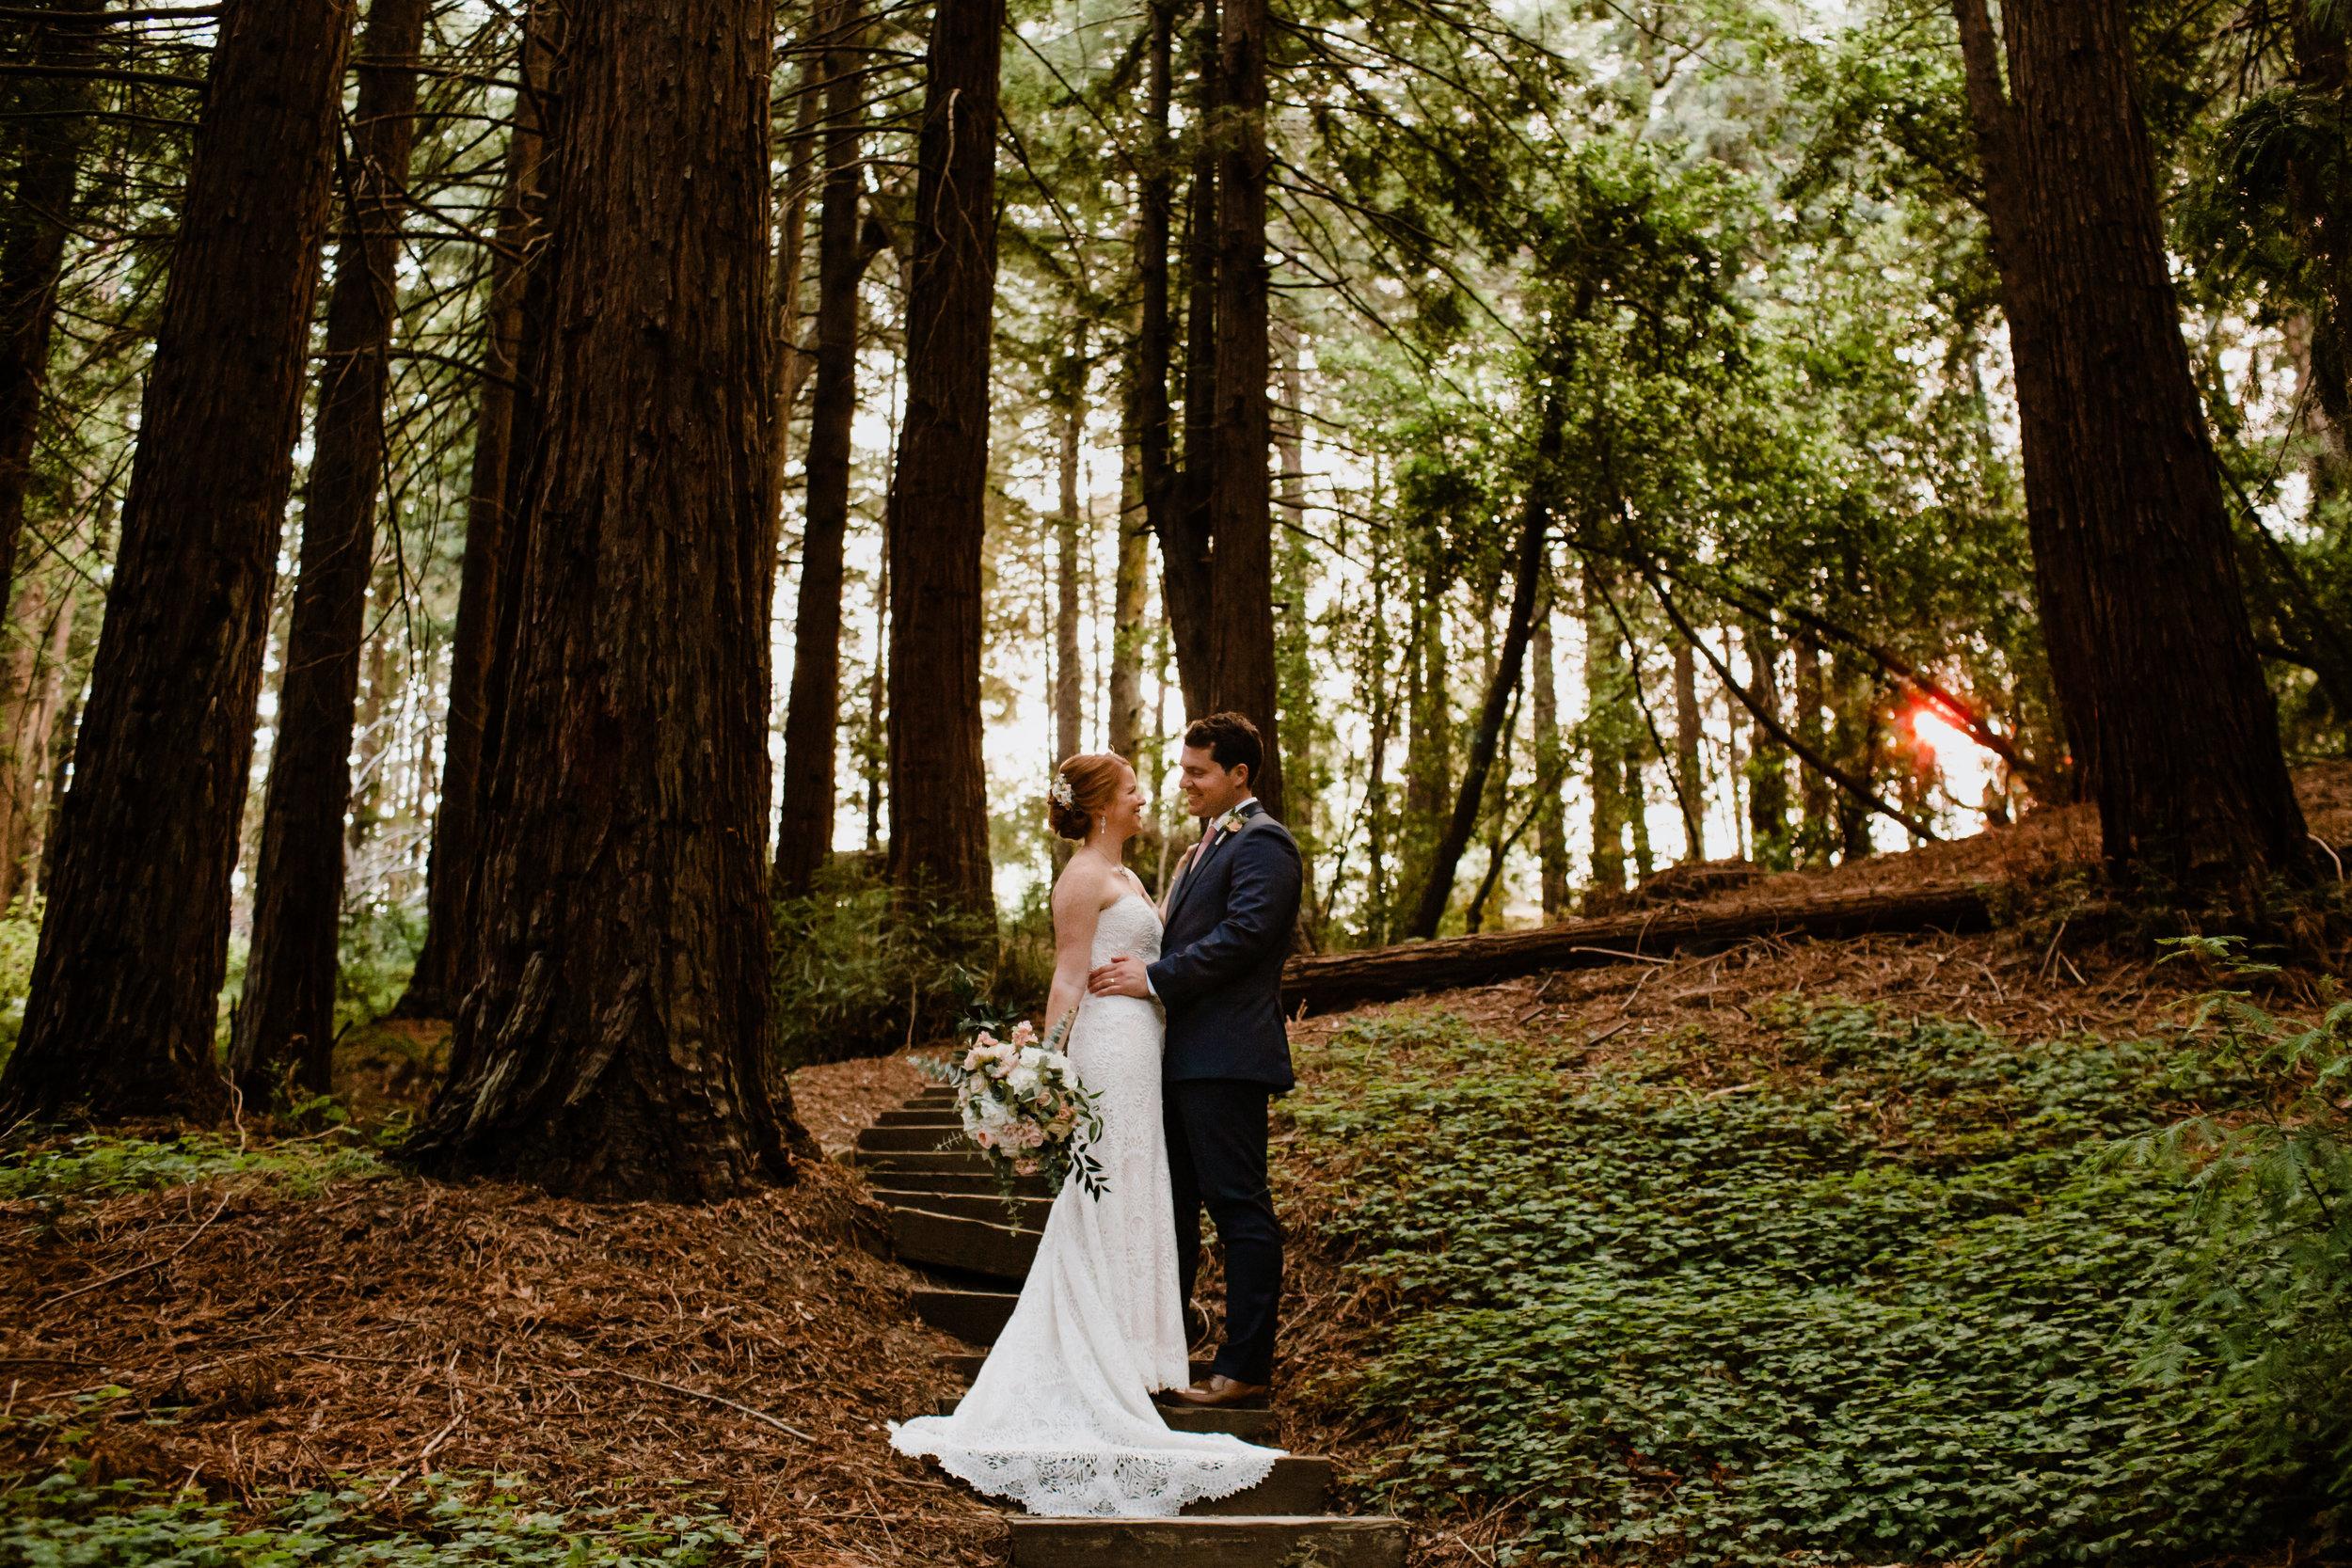 Shauna + Craig UC Berkeley Botanical Gardens Outdoor Wedding - Eve Rox Photography-43.jpg